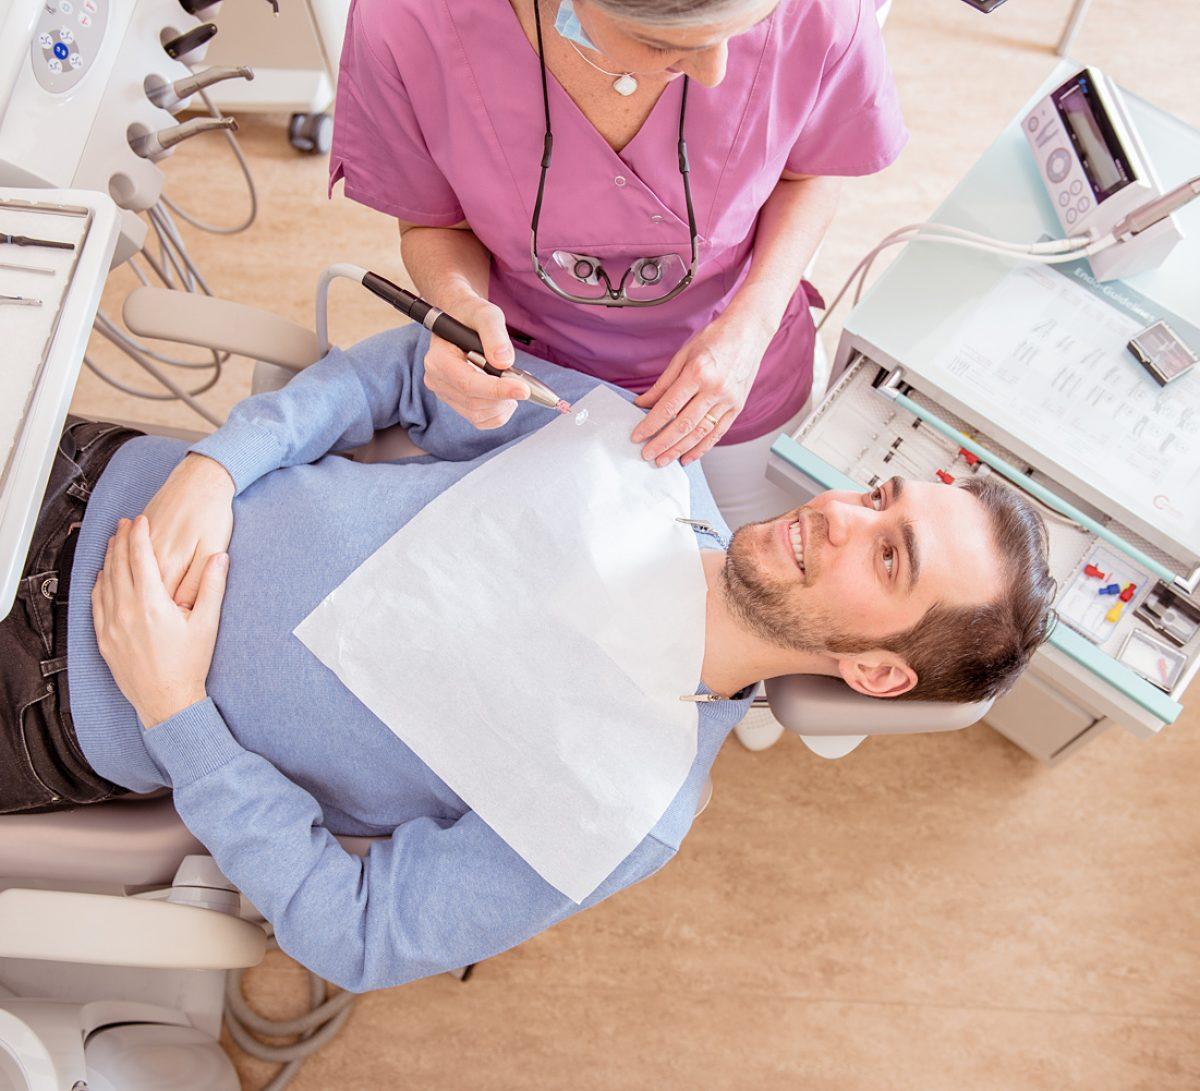 Wurzelkanalbehandlung - Zahnarztpraxis Sabine Quack, Berlin Friedrichshain